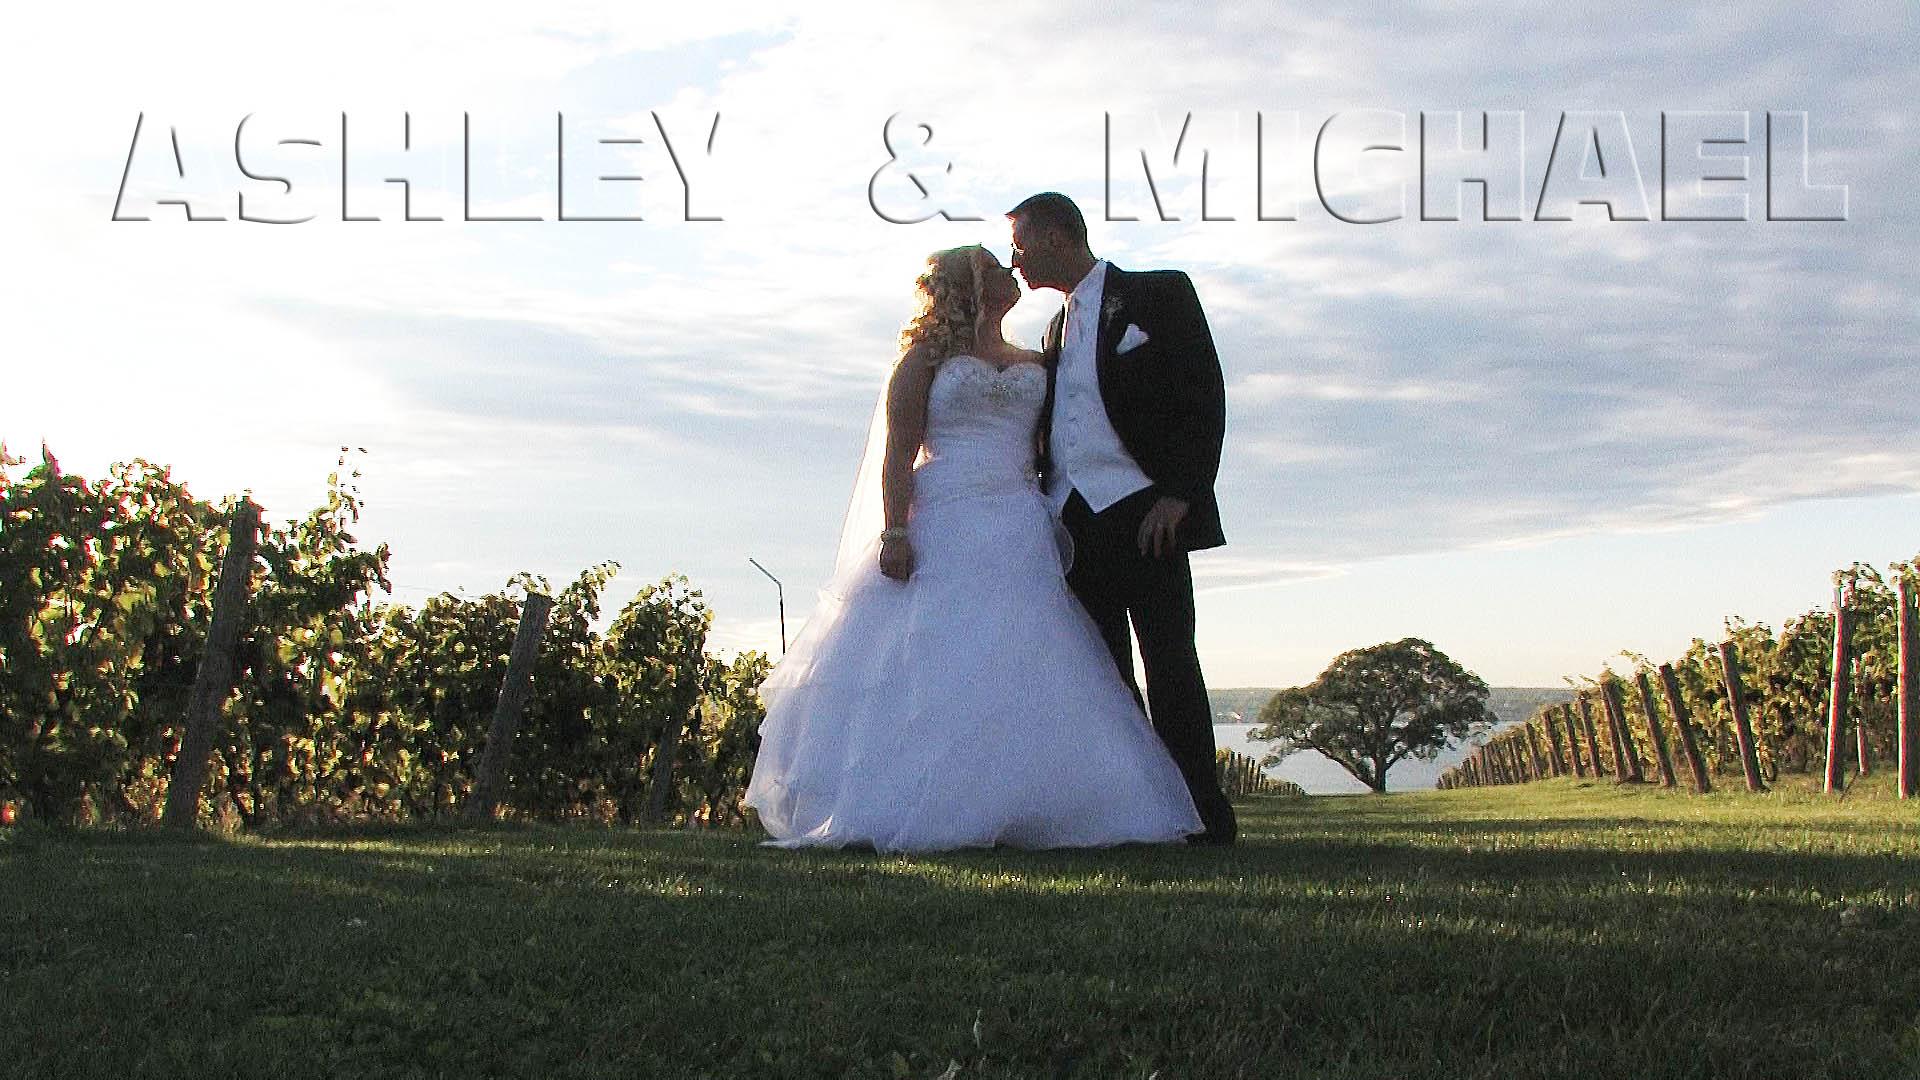 Michael & Ashley – Finger Lakes Wedding Video